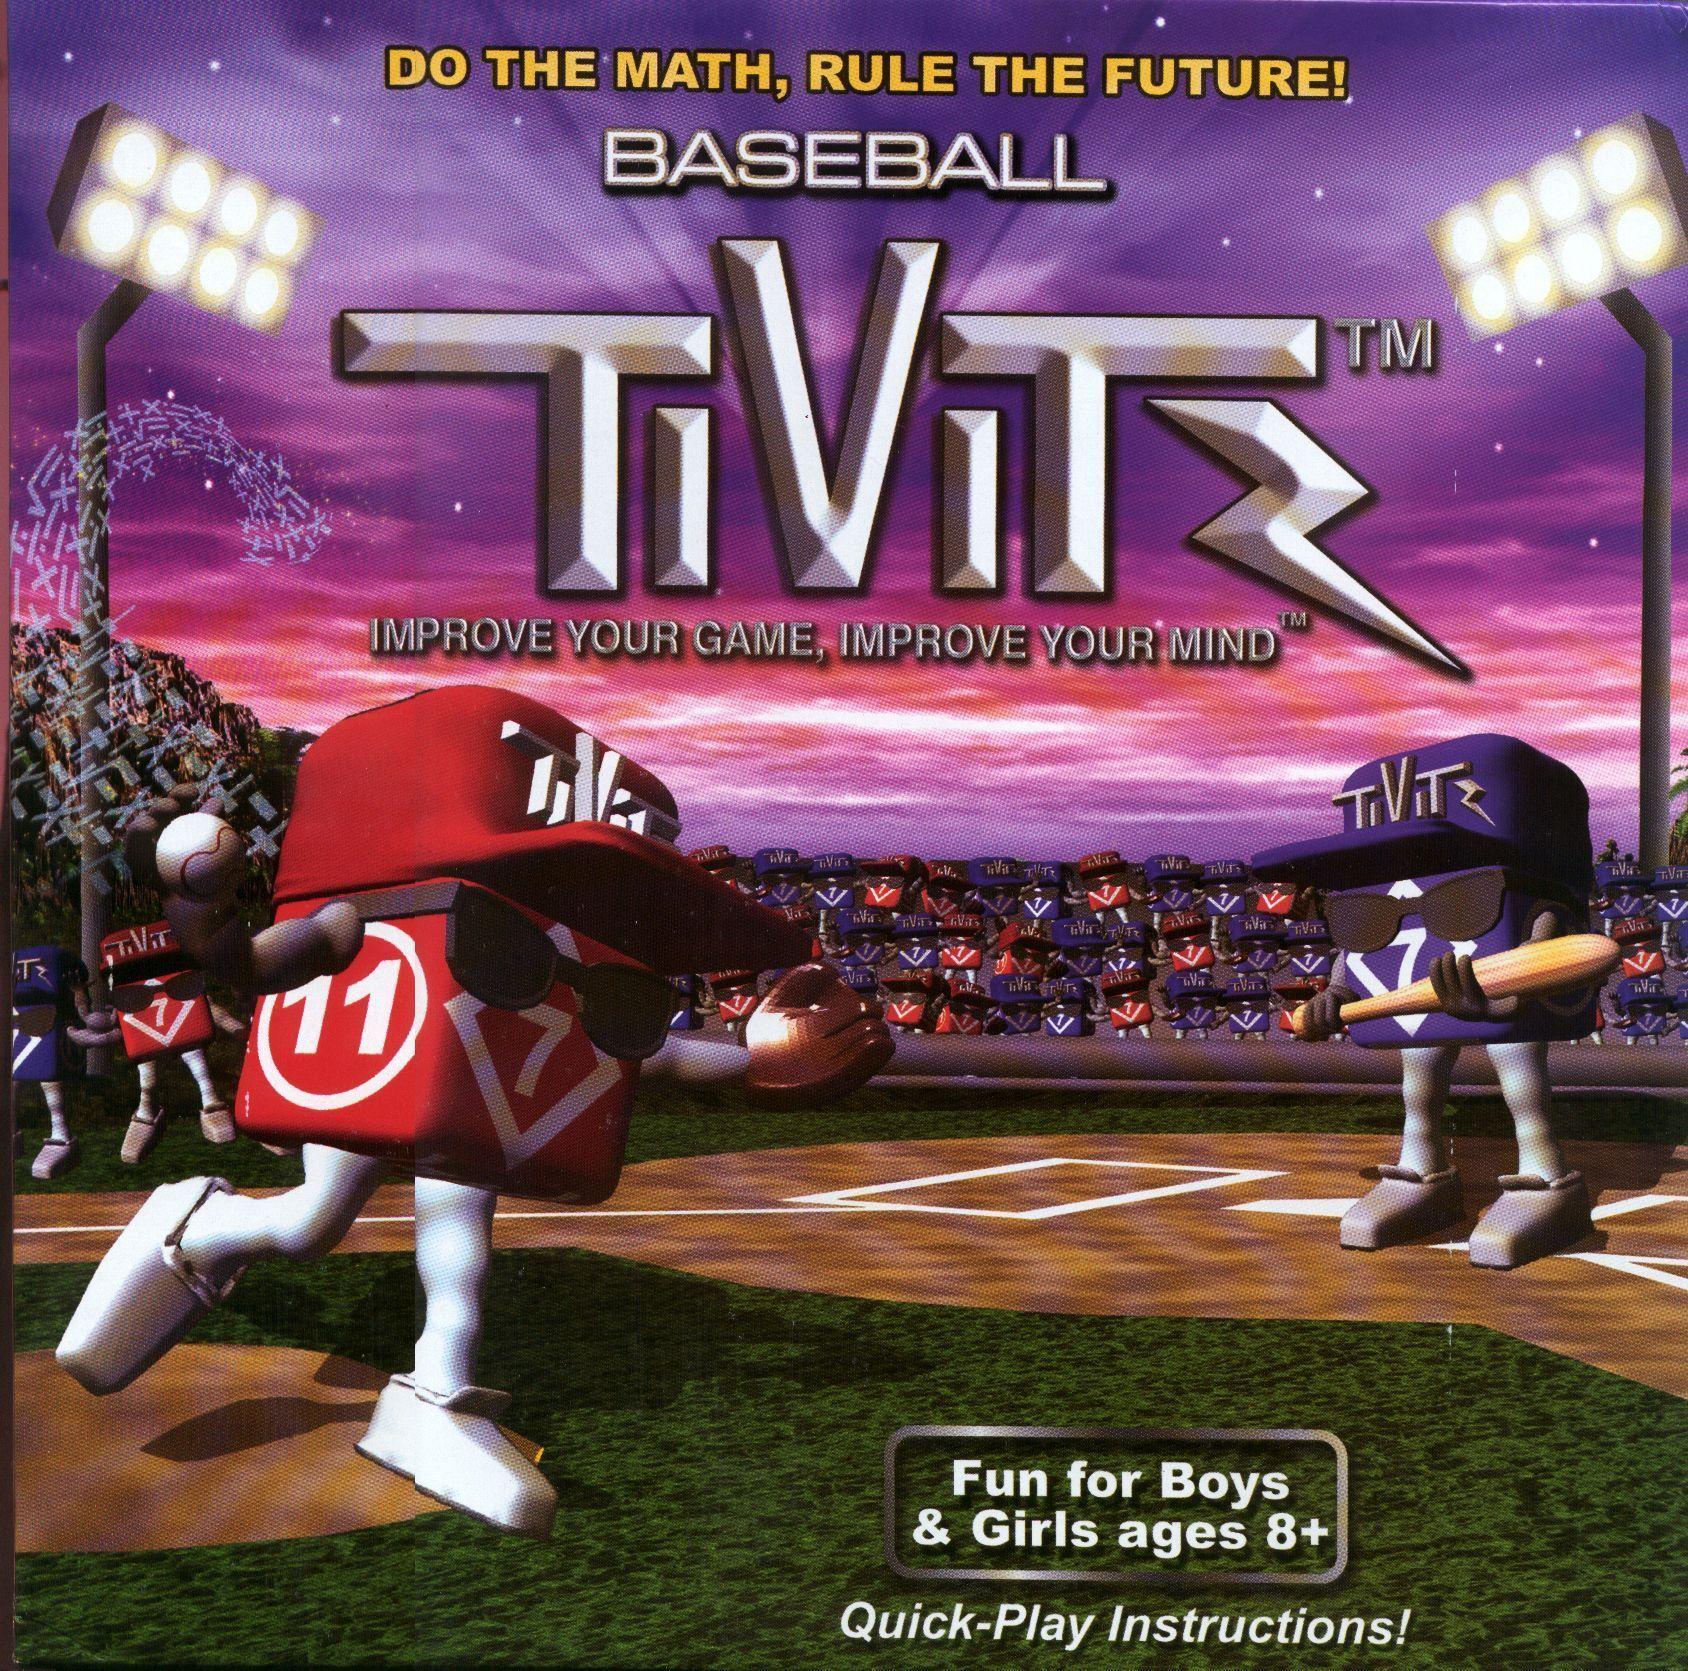 Baseball Tivitz